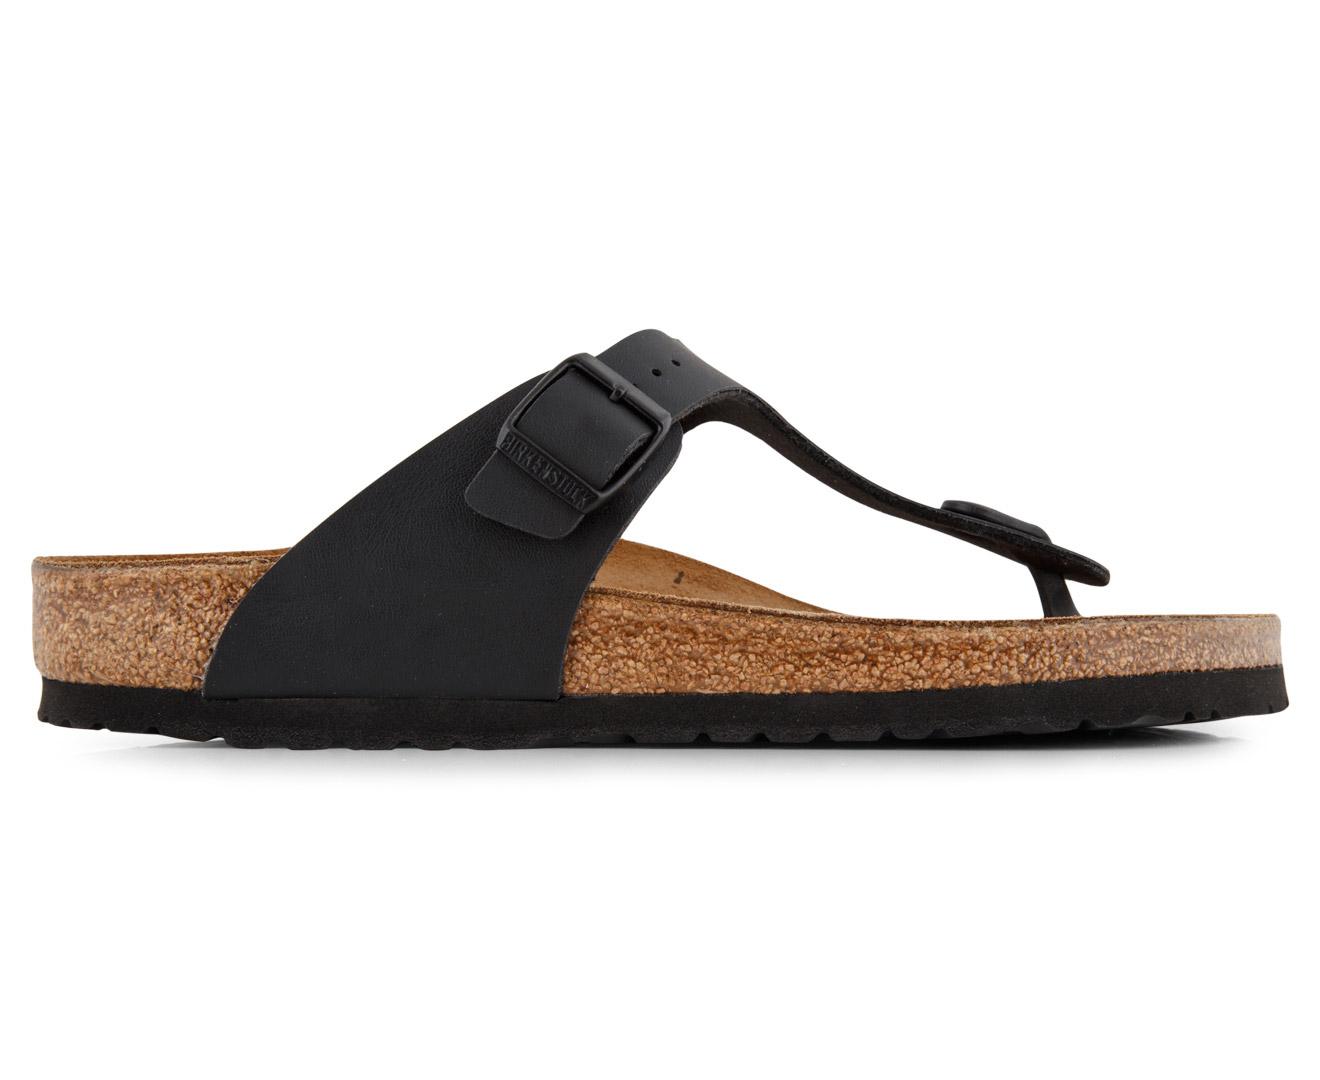 53bd01c5630 Chocolate Birkenstock Arizona Size 9 Sandal For Plantar Fasciitis ...